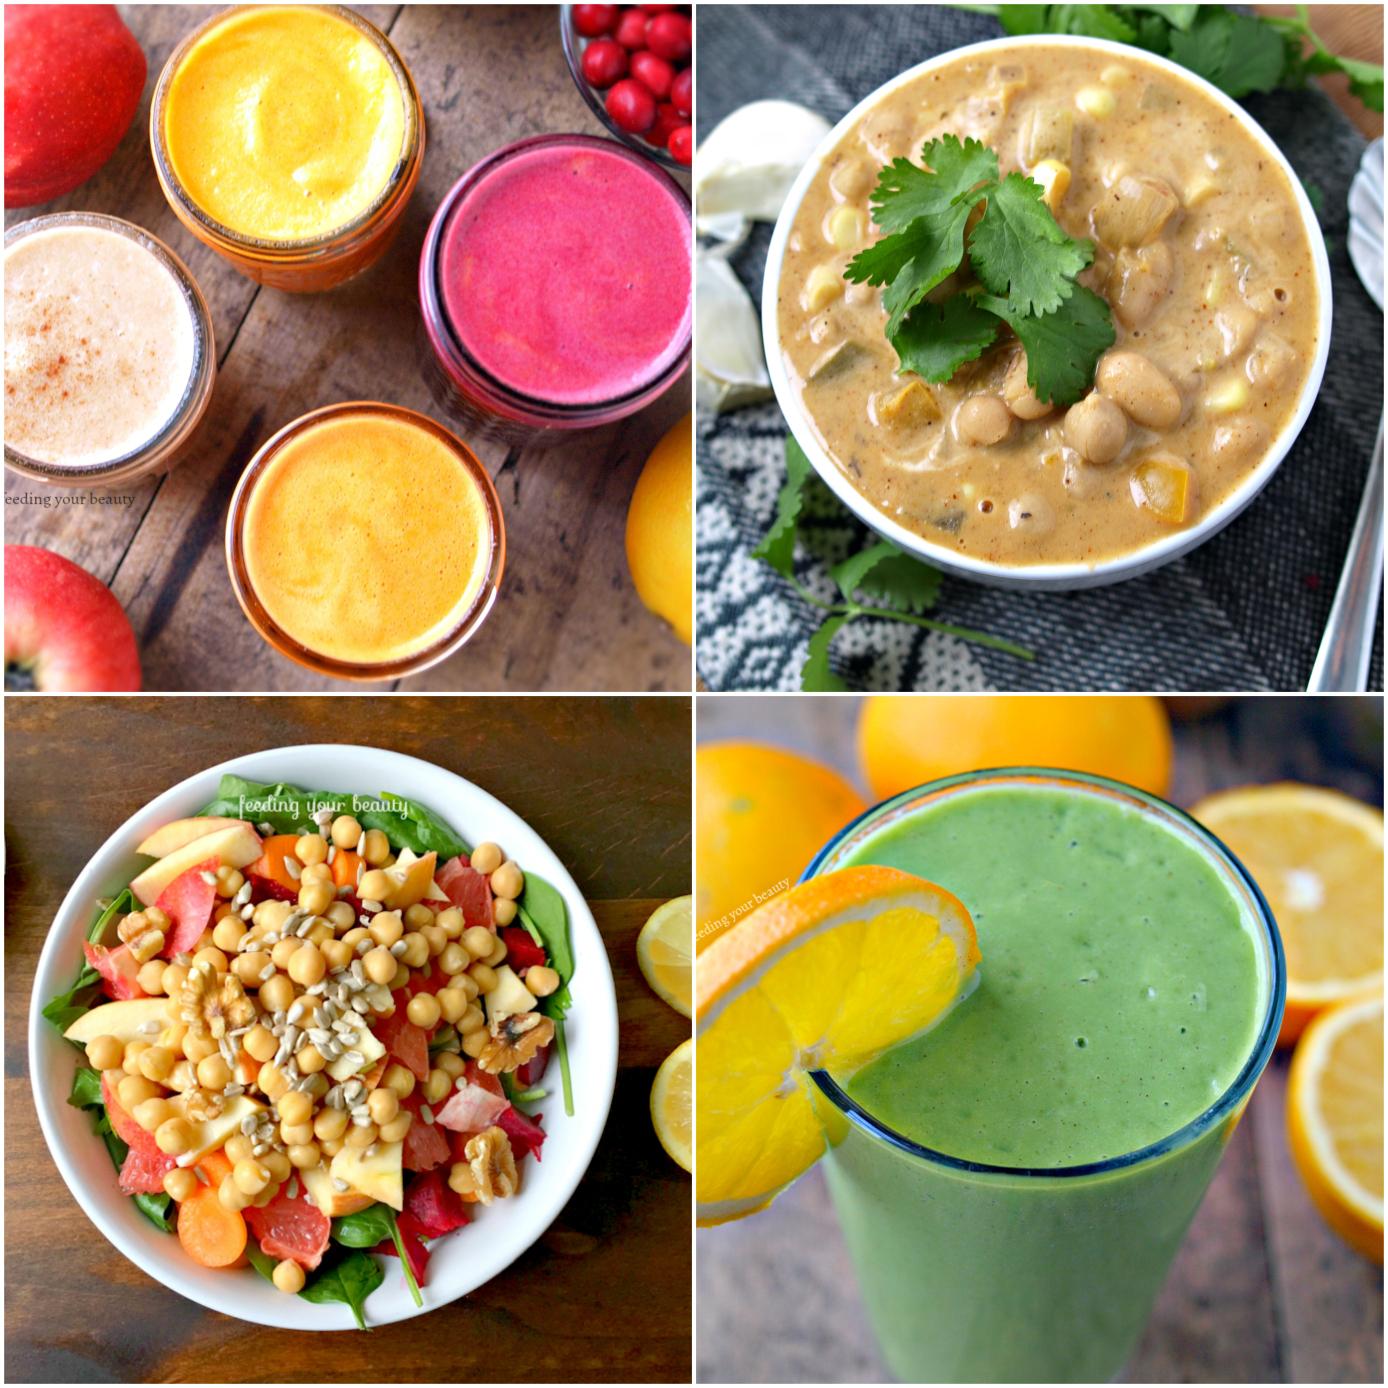 soup-salad-smoothie-jump-start-clean-eating-plan